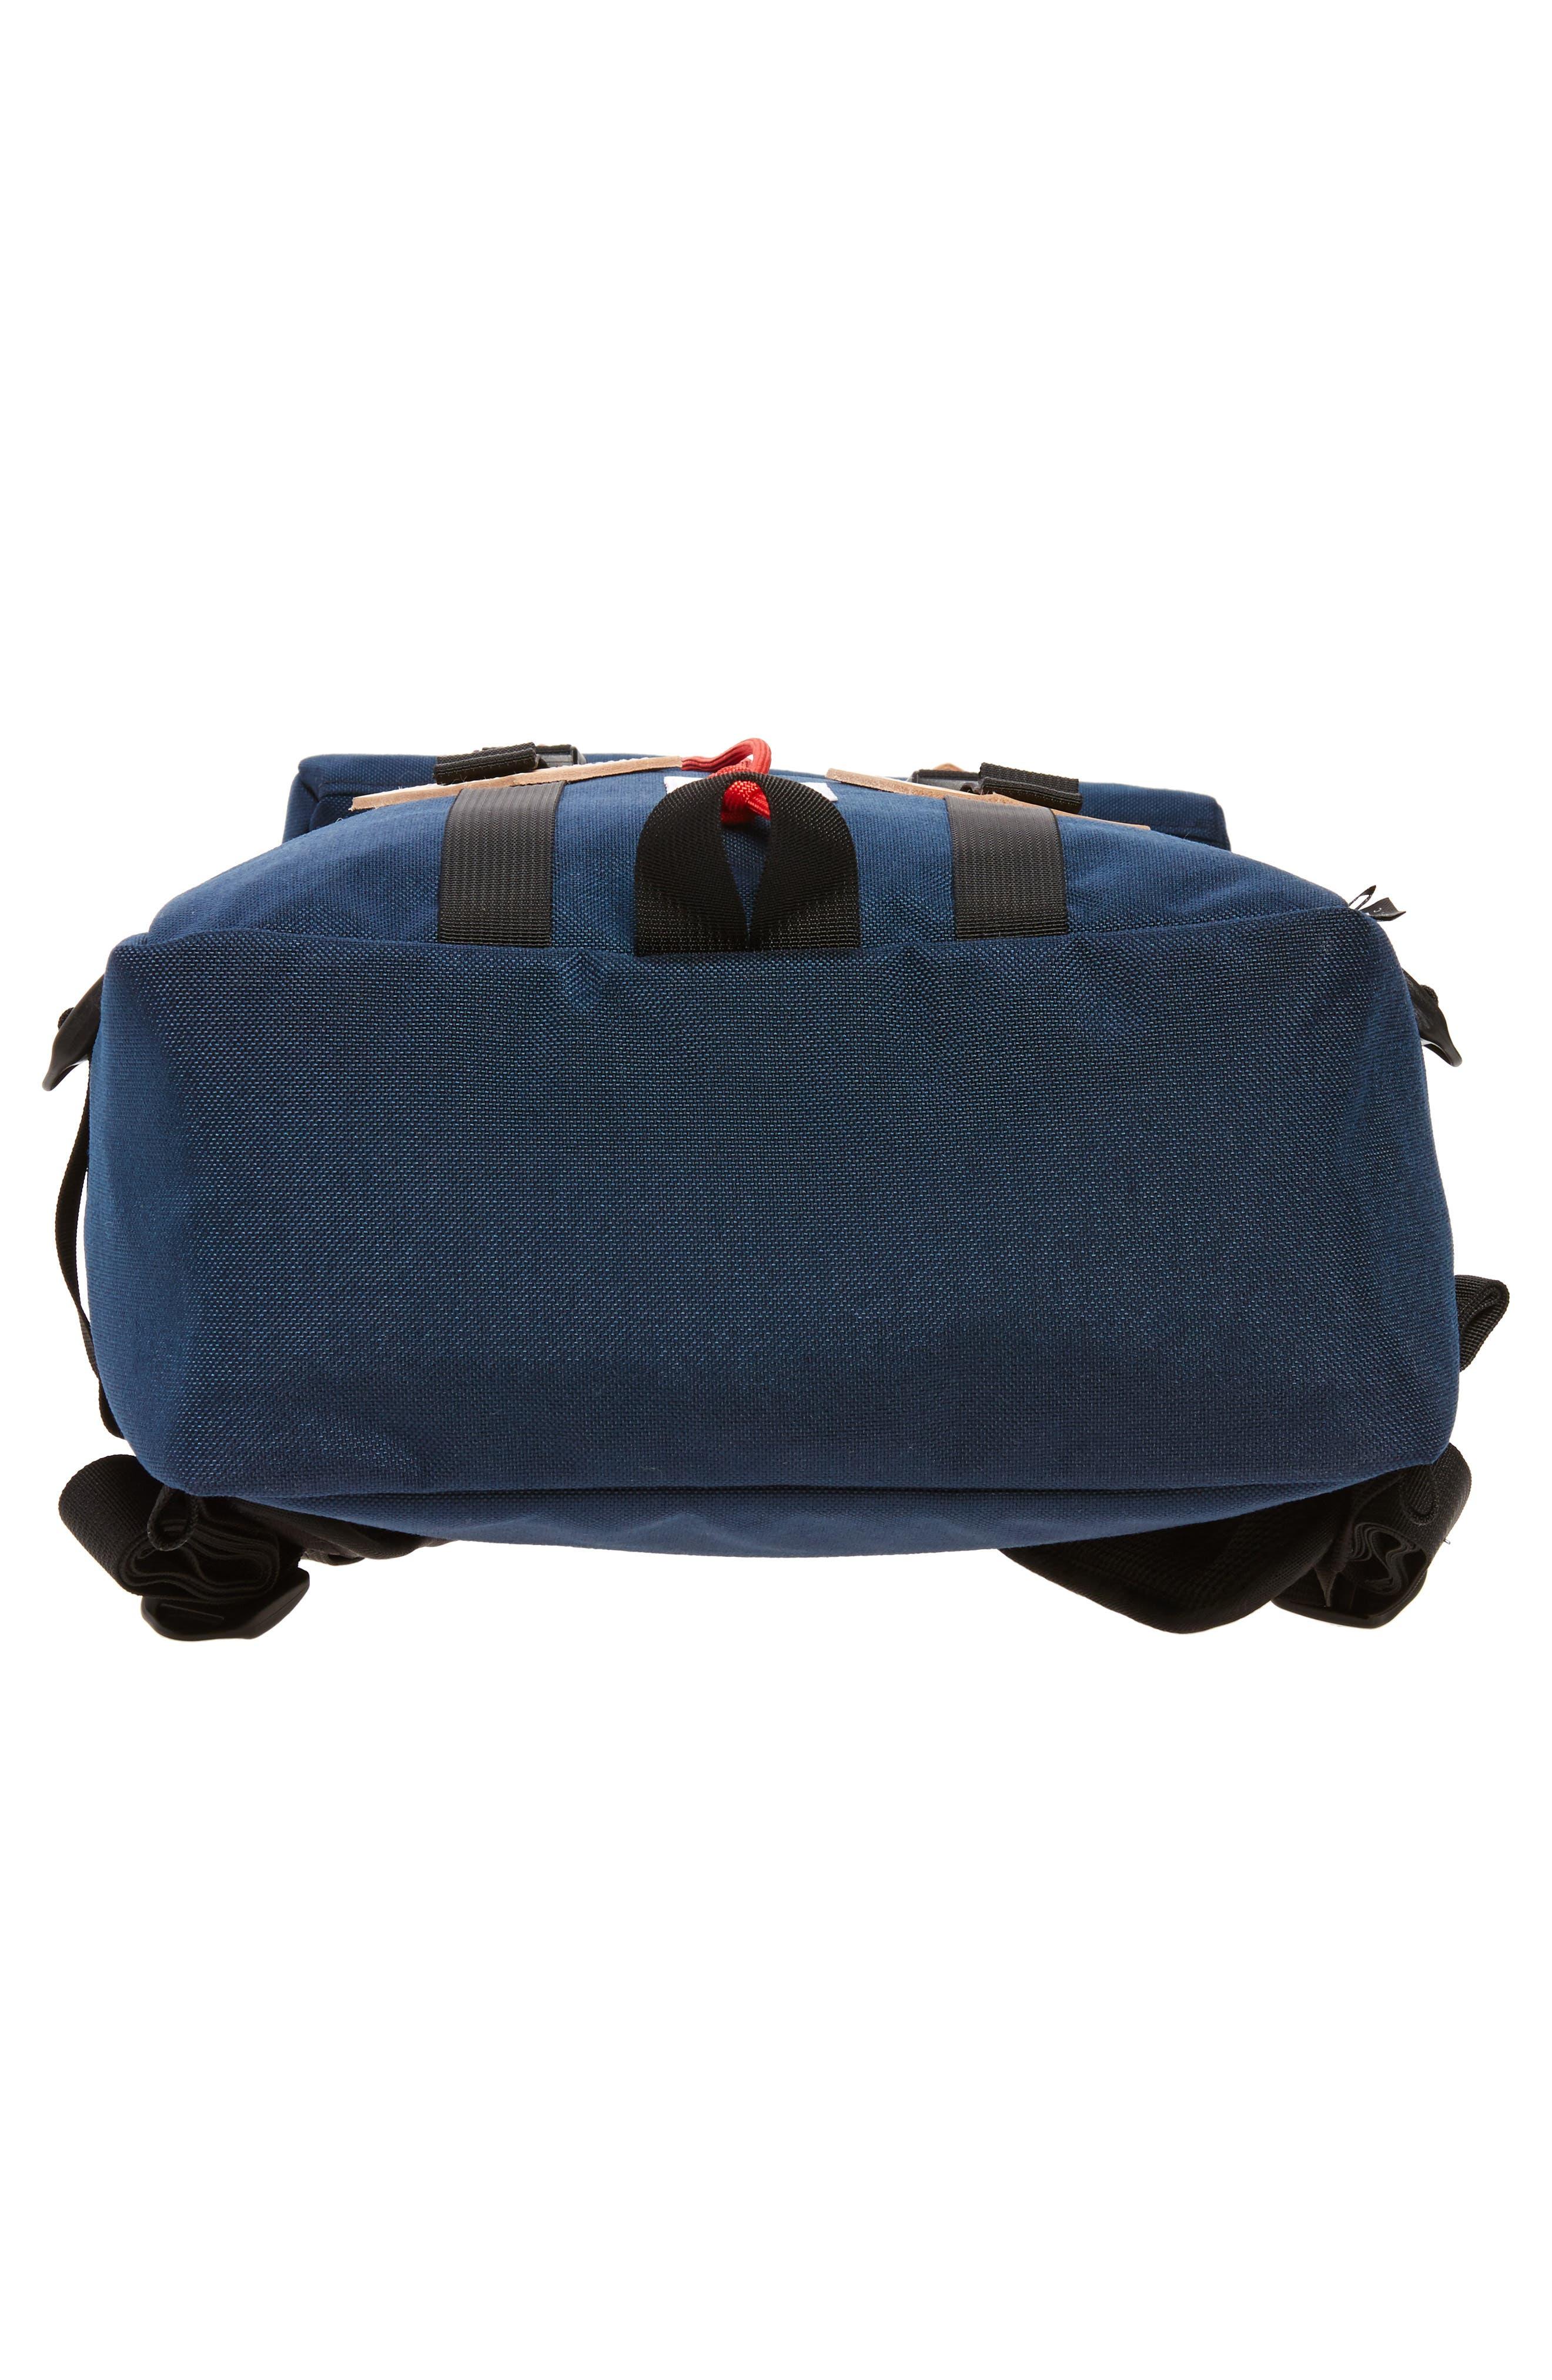 'Klettersack' Backpack,                             Alternate thumbnail 6, color,                             Navy